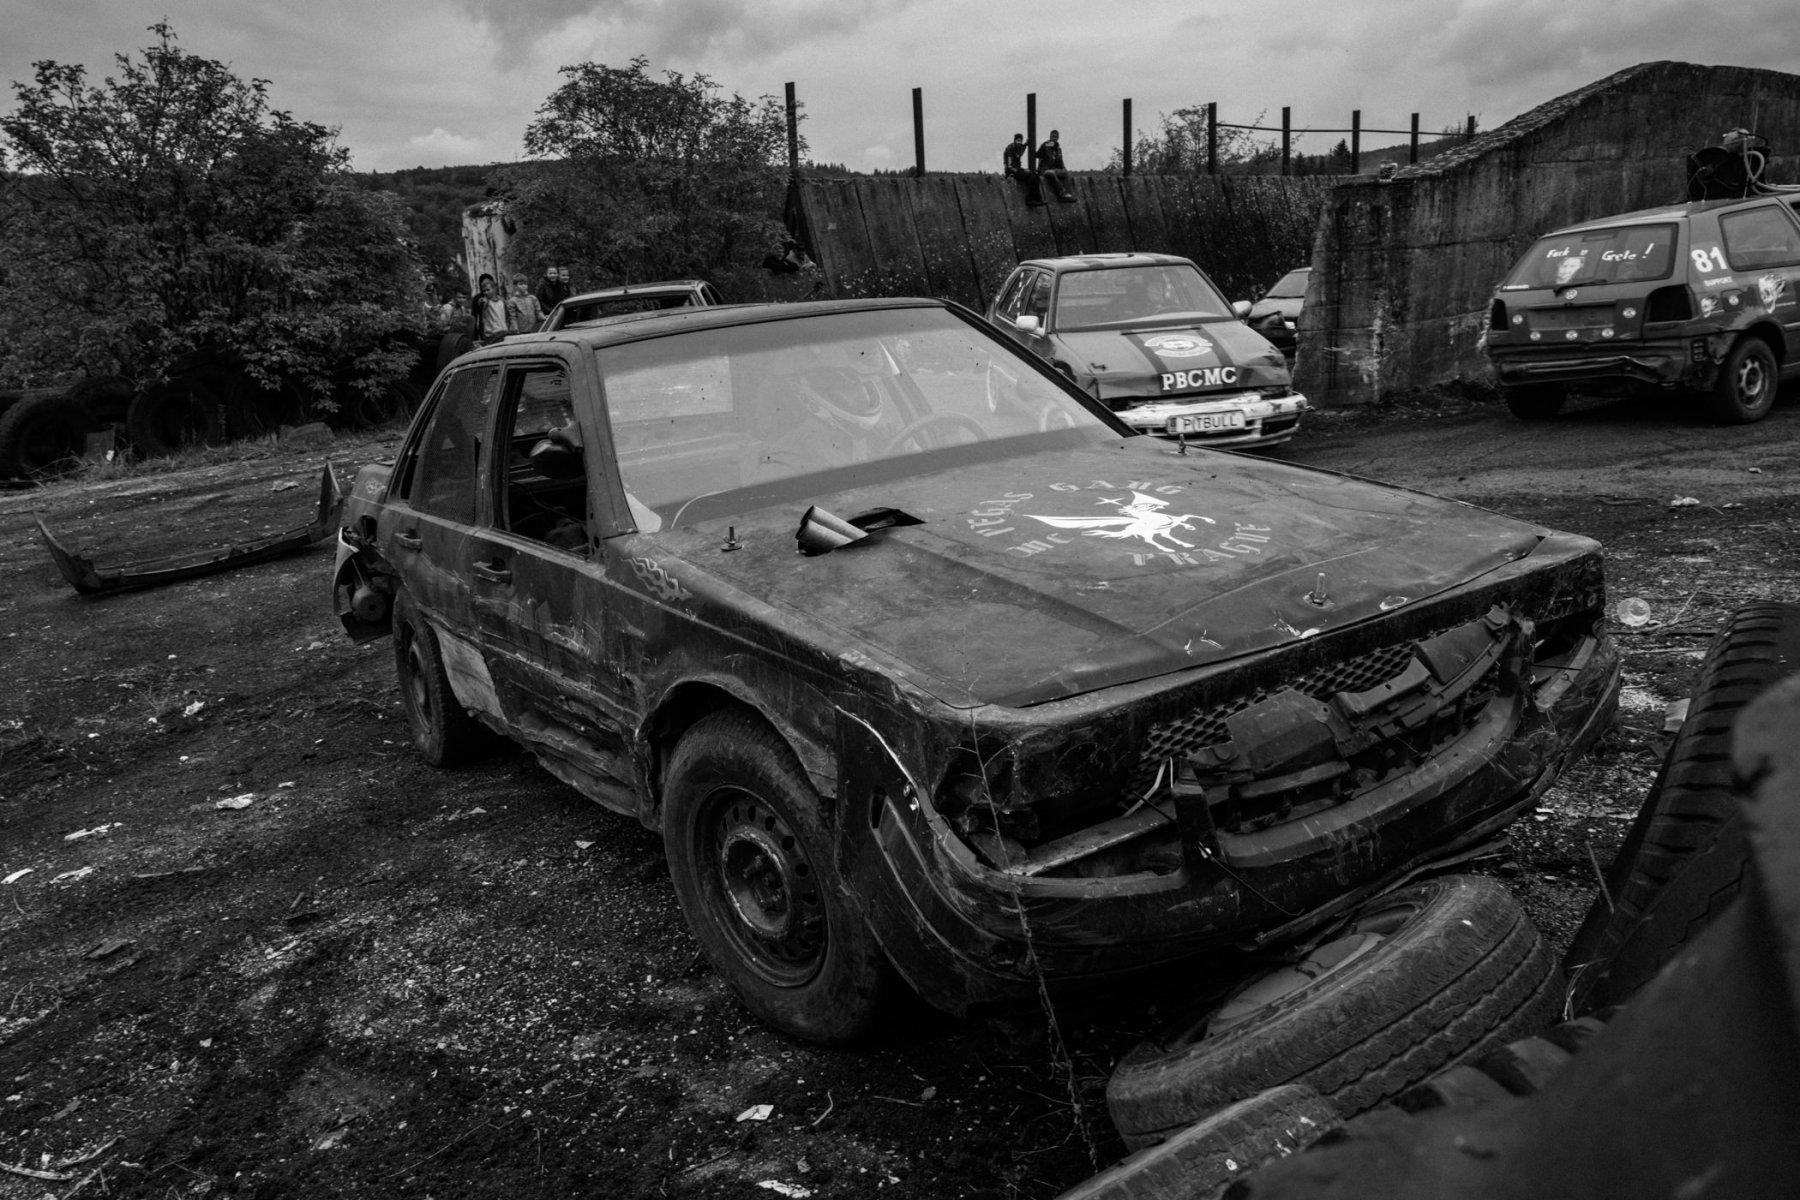 kevin_v_ton_Crash-Cars_09